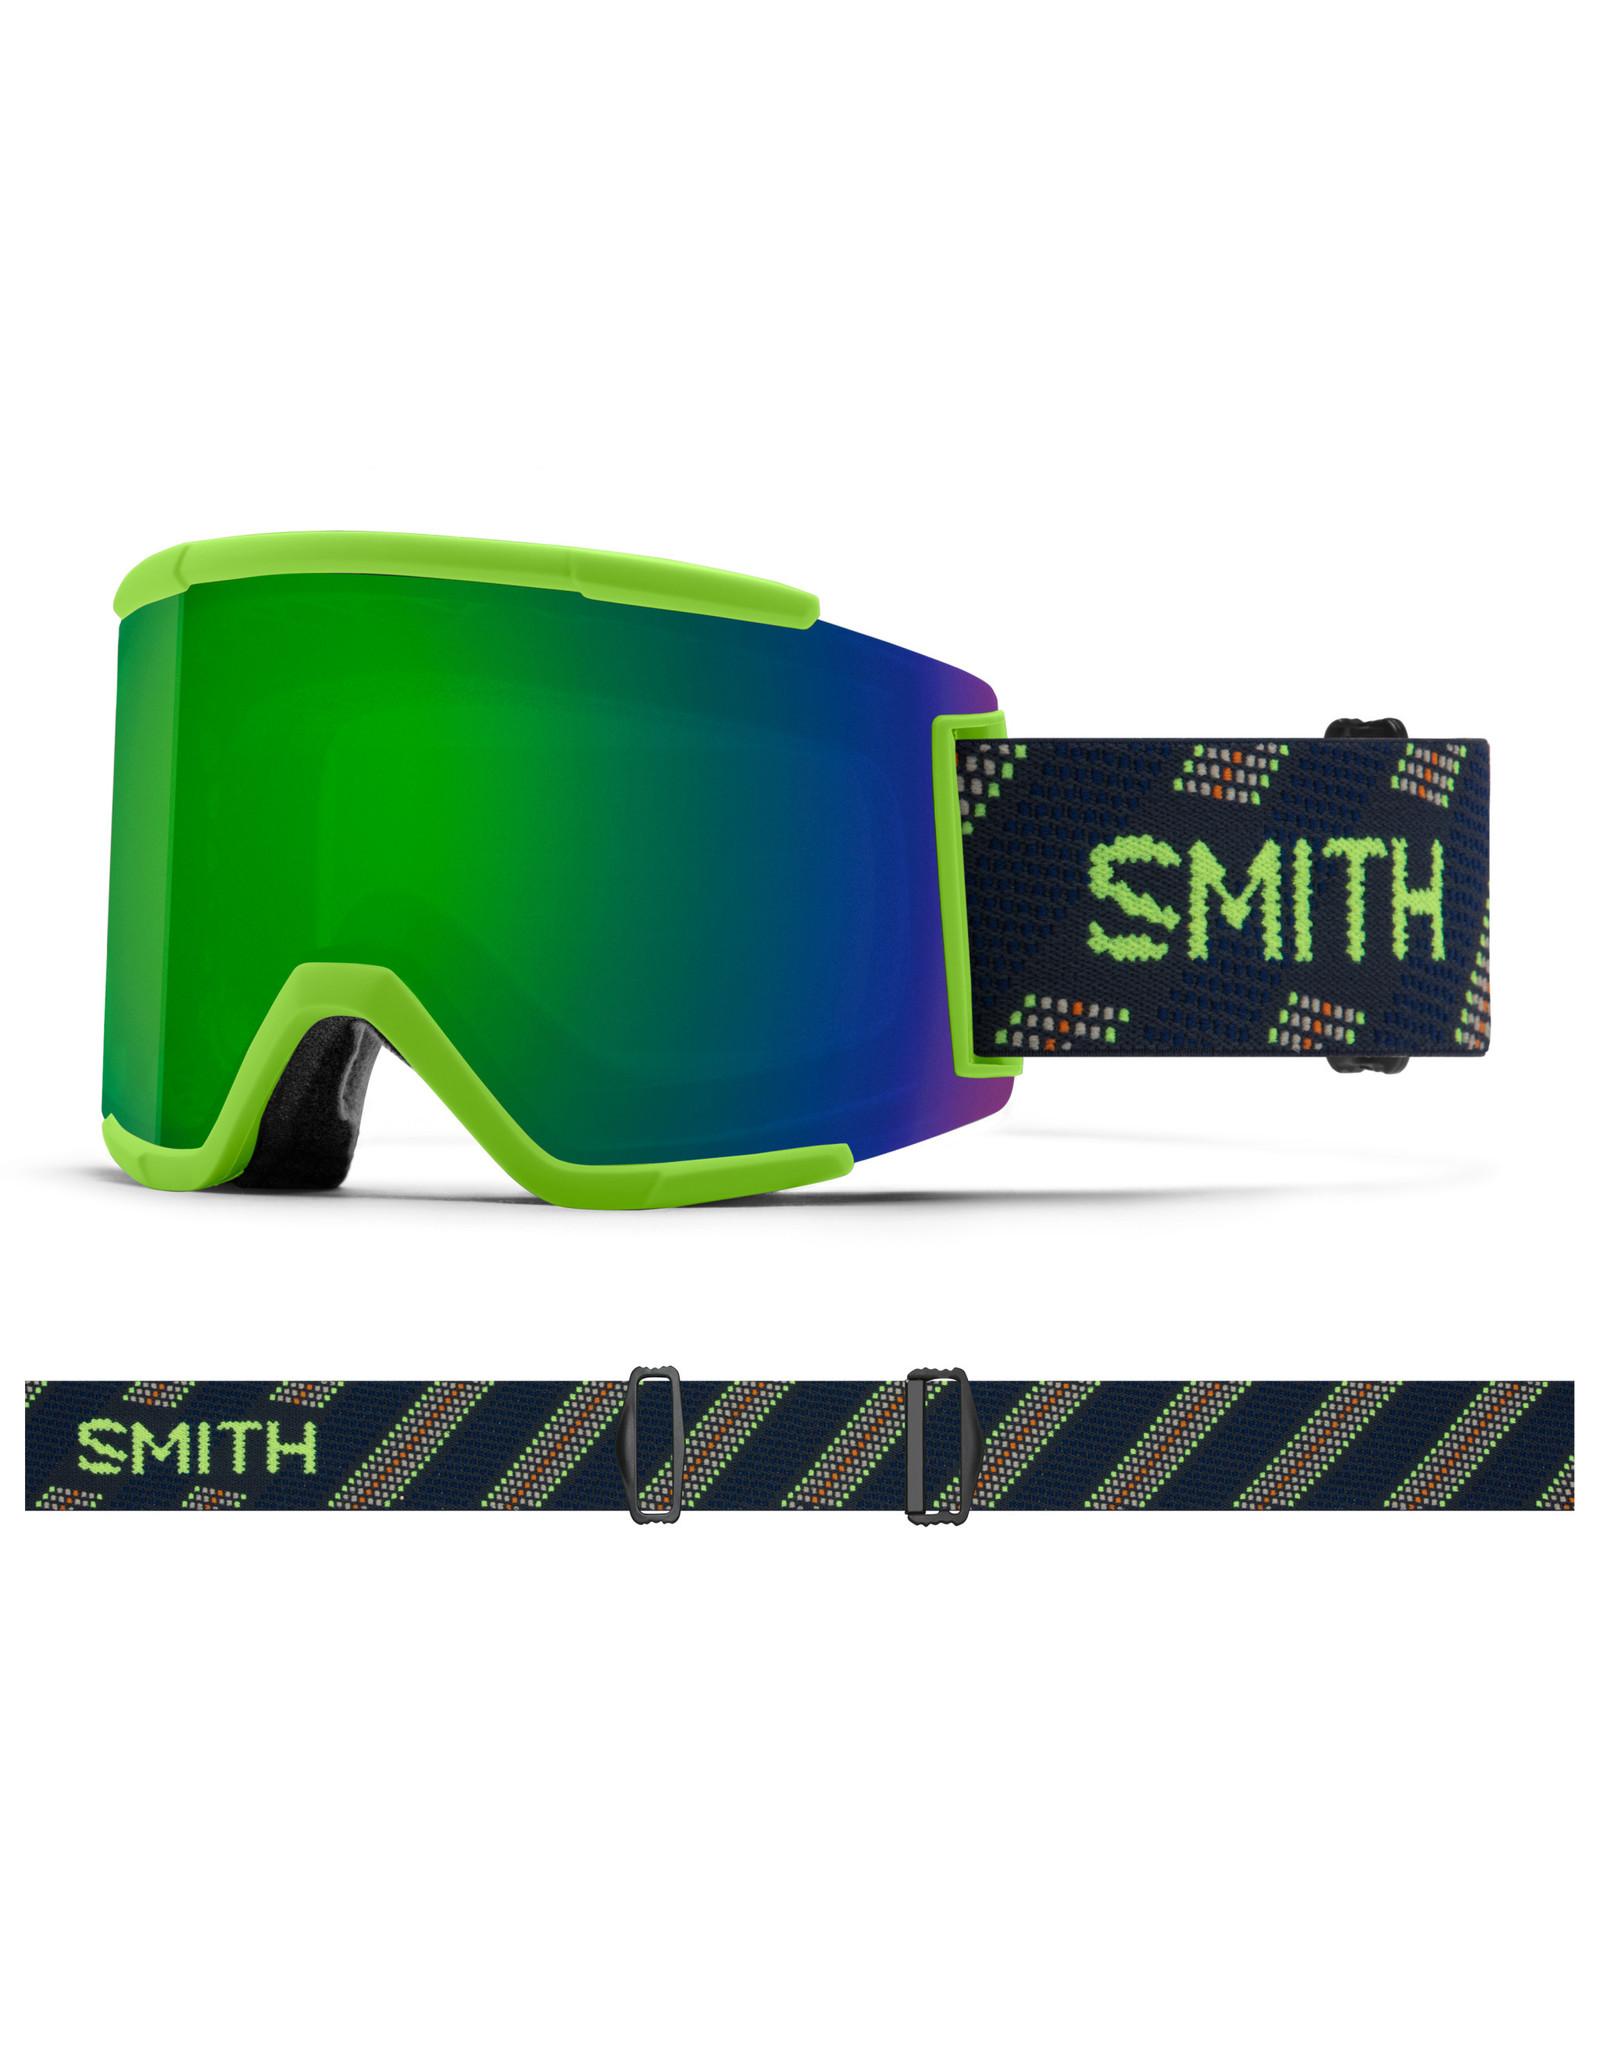 Smith SMITH SQUAD XL LIMELIGHT ANCHOR 20 LUNETTES DE SKI